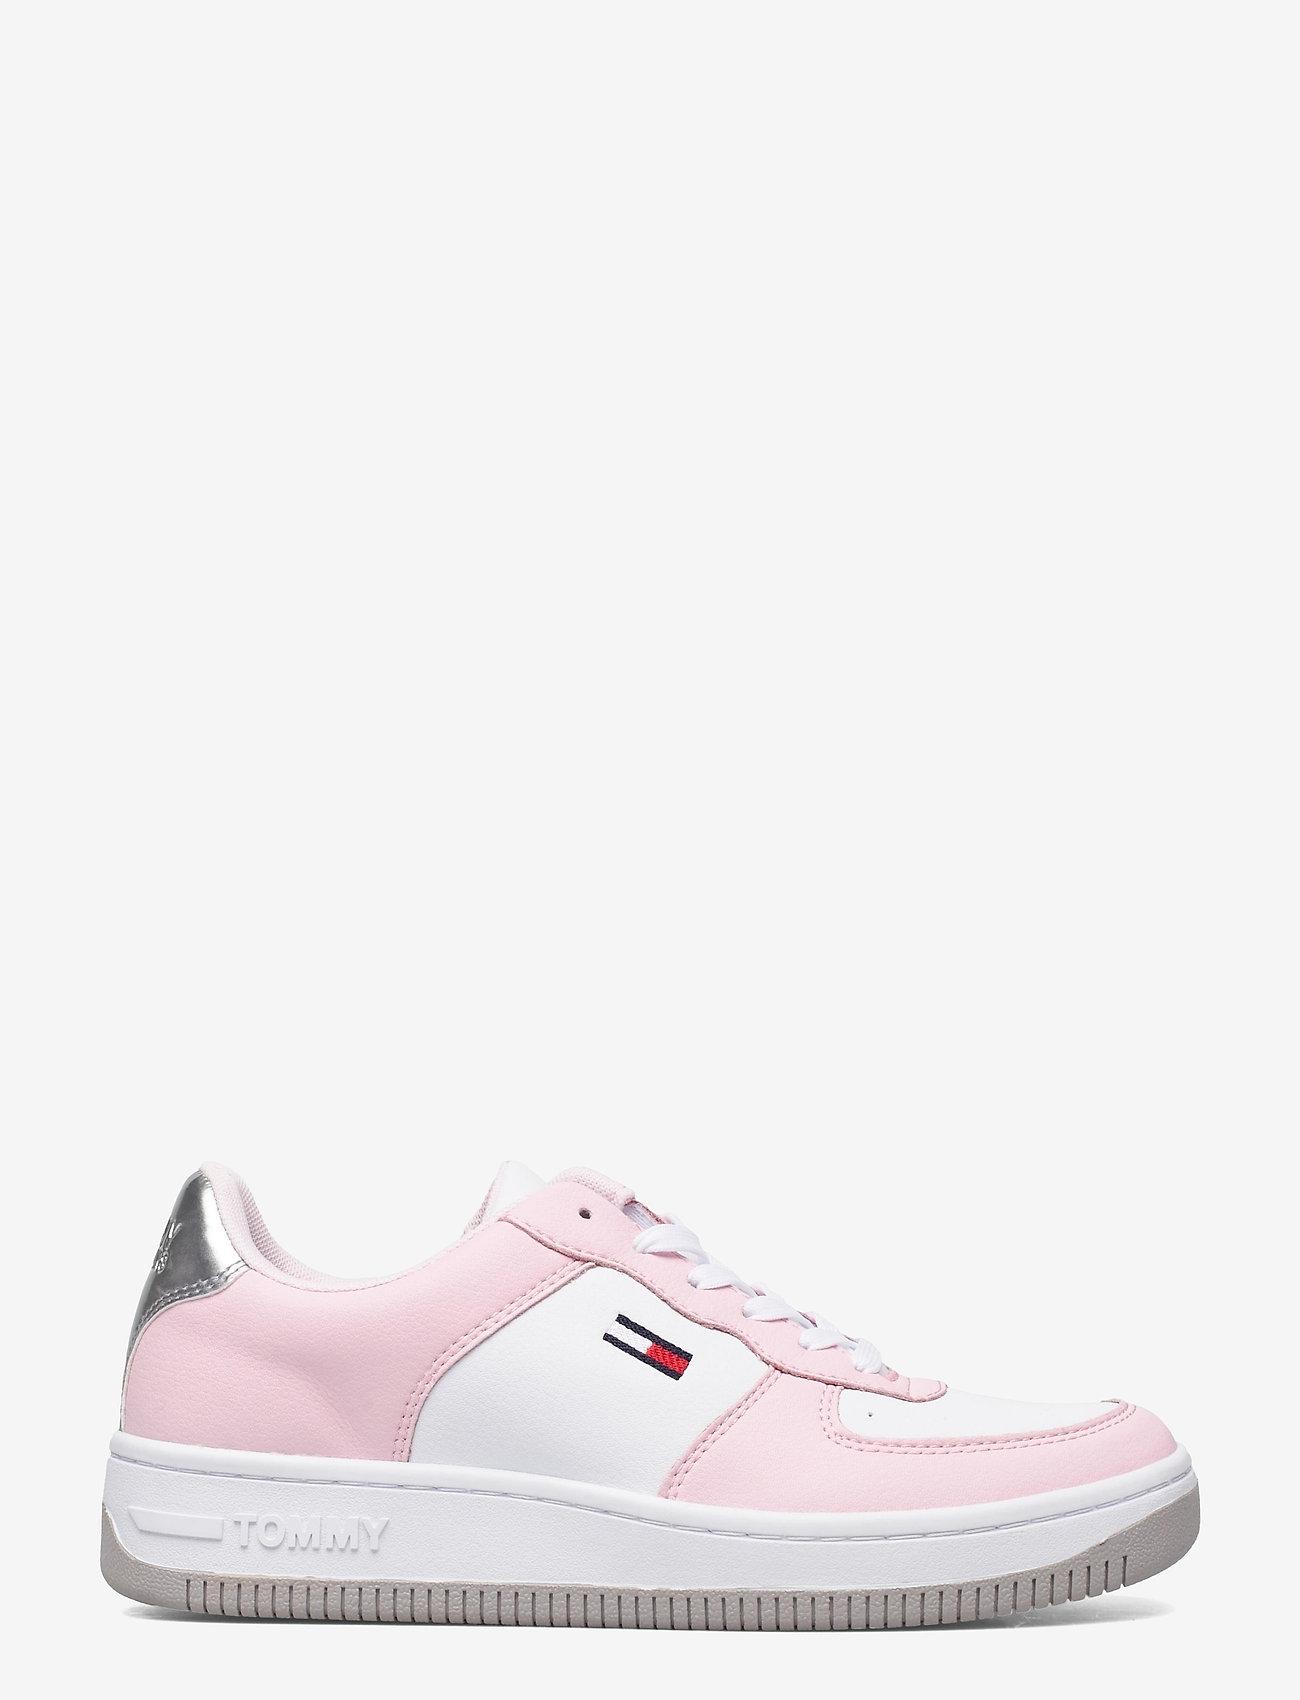 Tommy Hilfiger - WMNS TOMMY JEANS BASKET SNEAKER - low top sneakers - light pink - 1